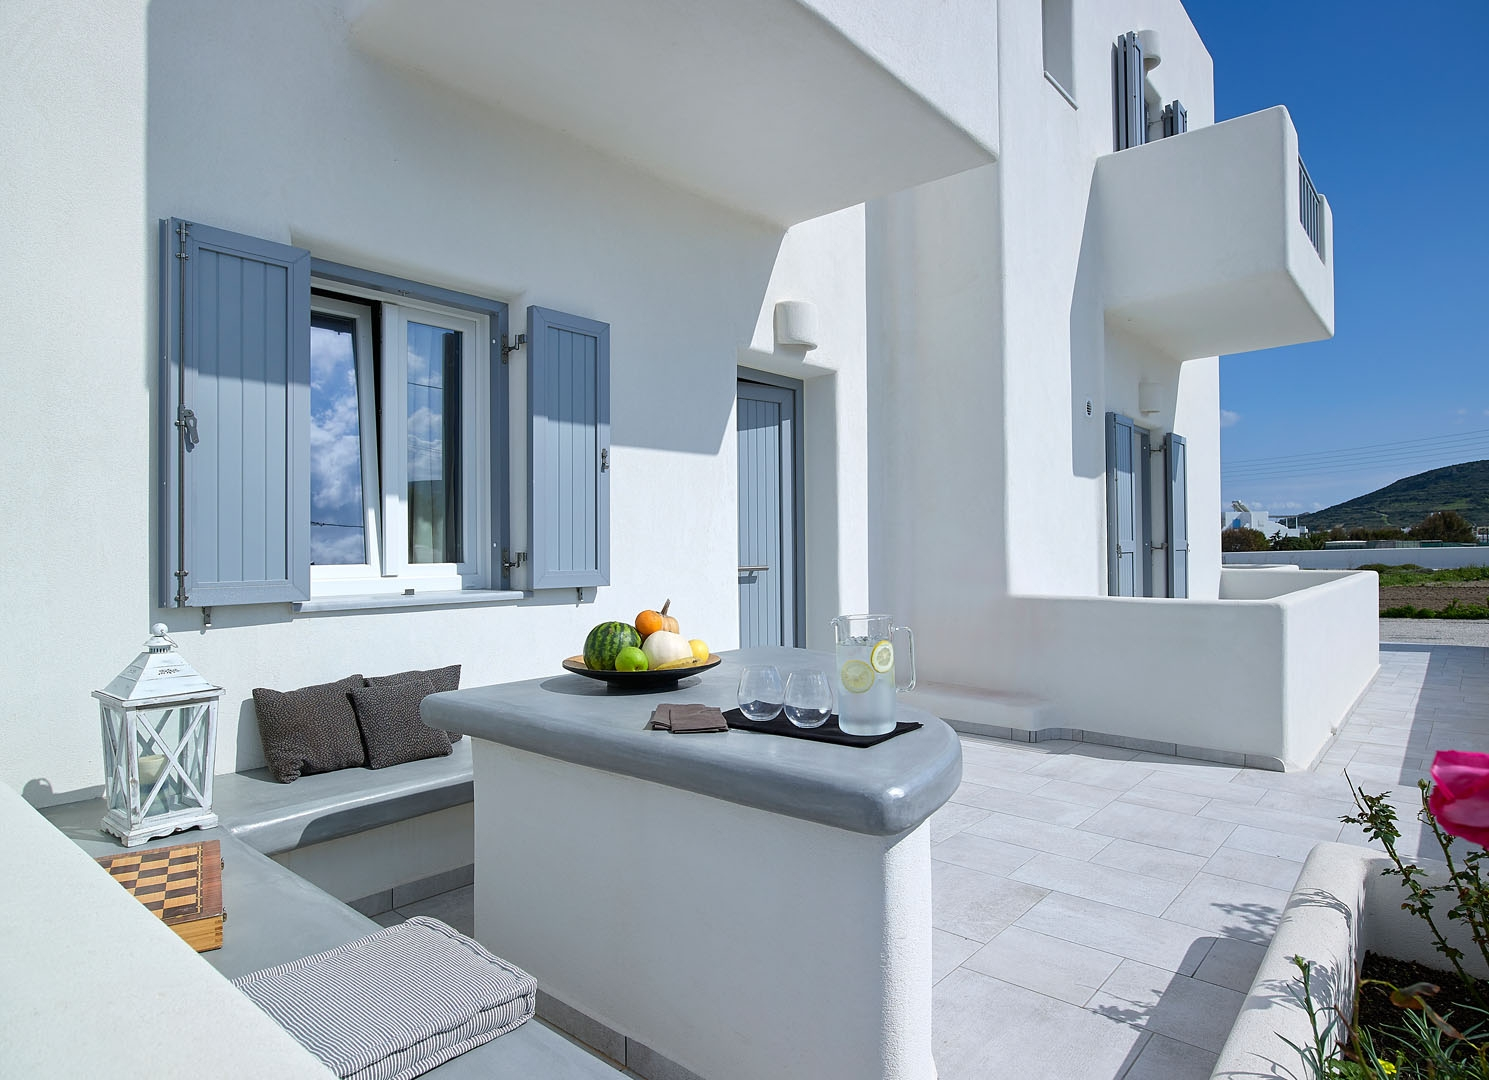 Garifalakis Comfort Rooms / Milos island